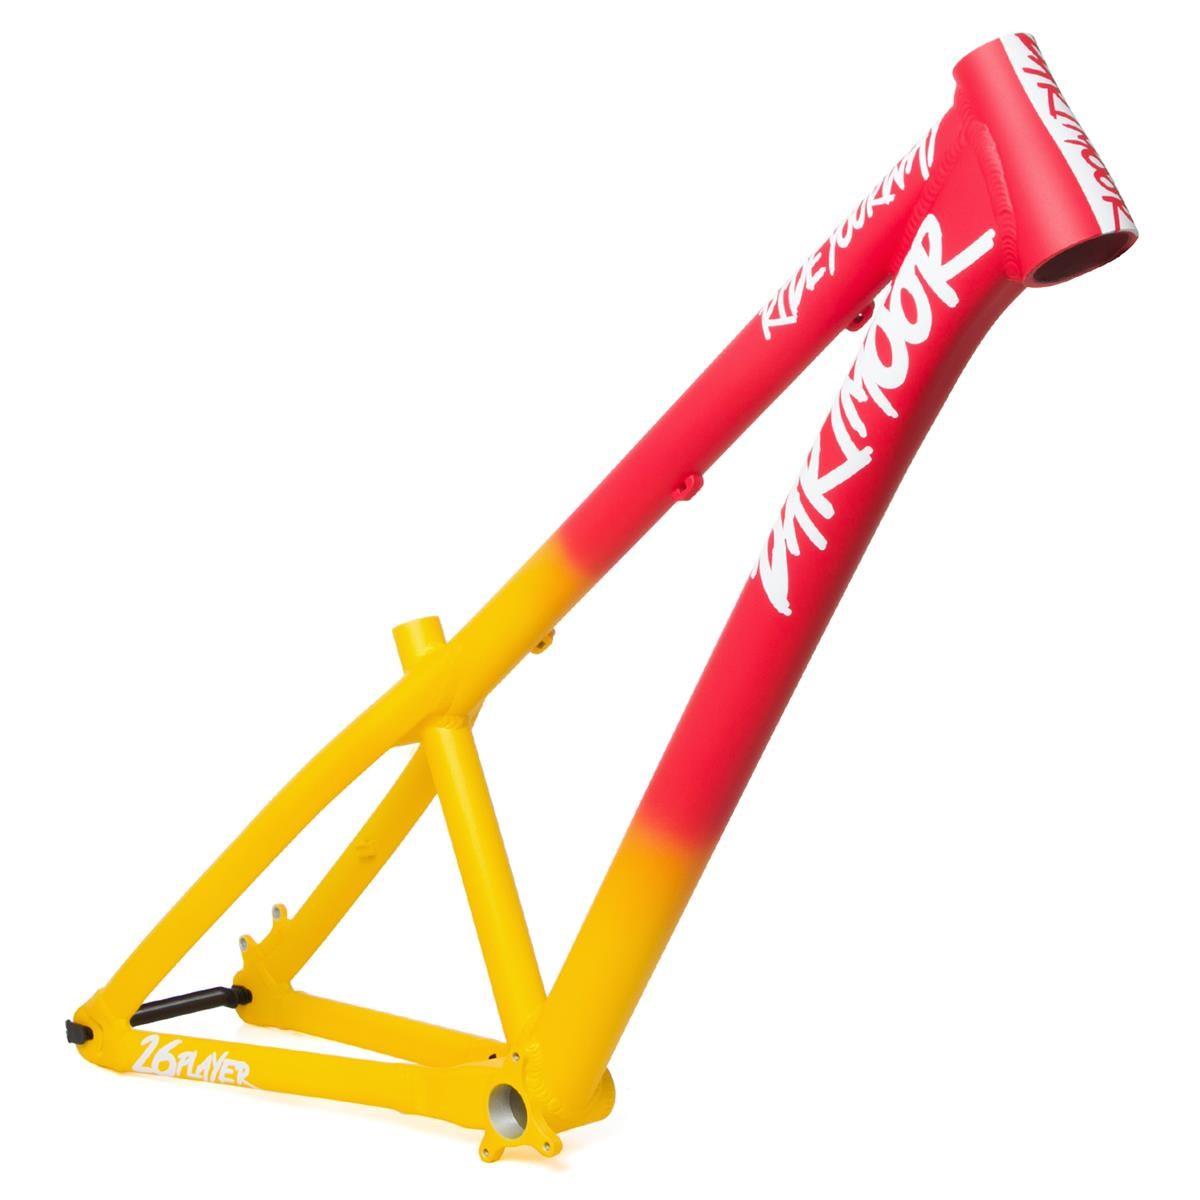 Dartmoor MTB-Rahmen Two6Player Aluminium, Miami Vice - Red/Yellow ...